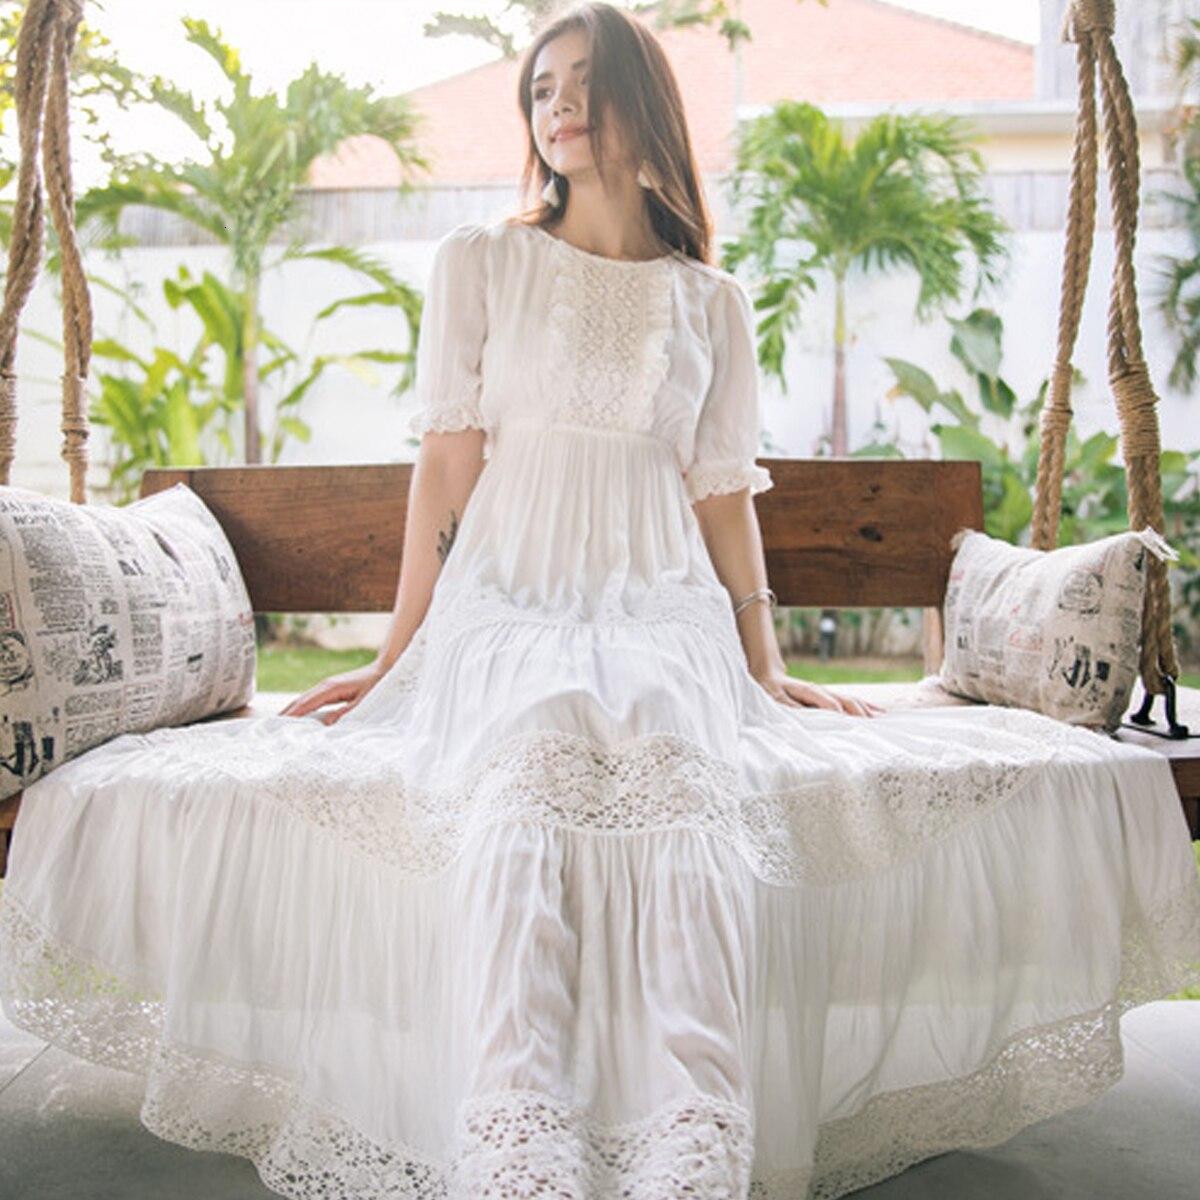 New Bohemian Hippie Big Swing Holiday Beach Dress O-Neck Half Sleeve Spring Summer Dresses Women White Patchwork Lace Dress 1